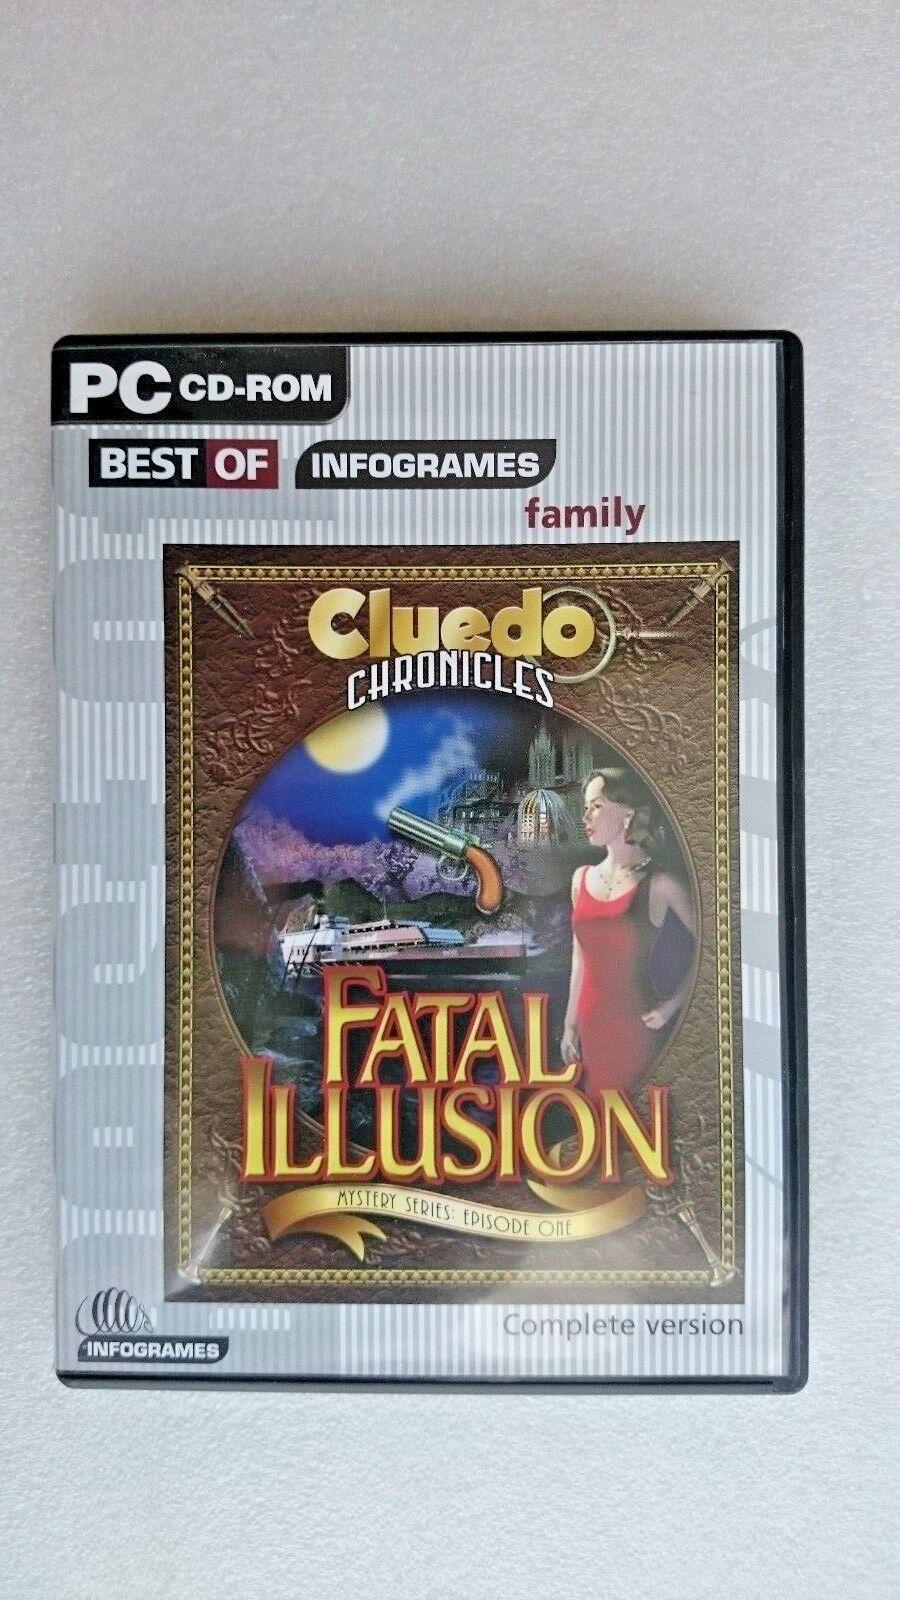 Cluedo Chronicles - Fatal Illusion (PC: Windows, 2000)